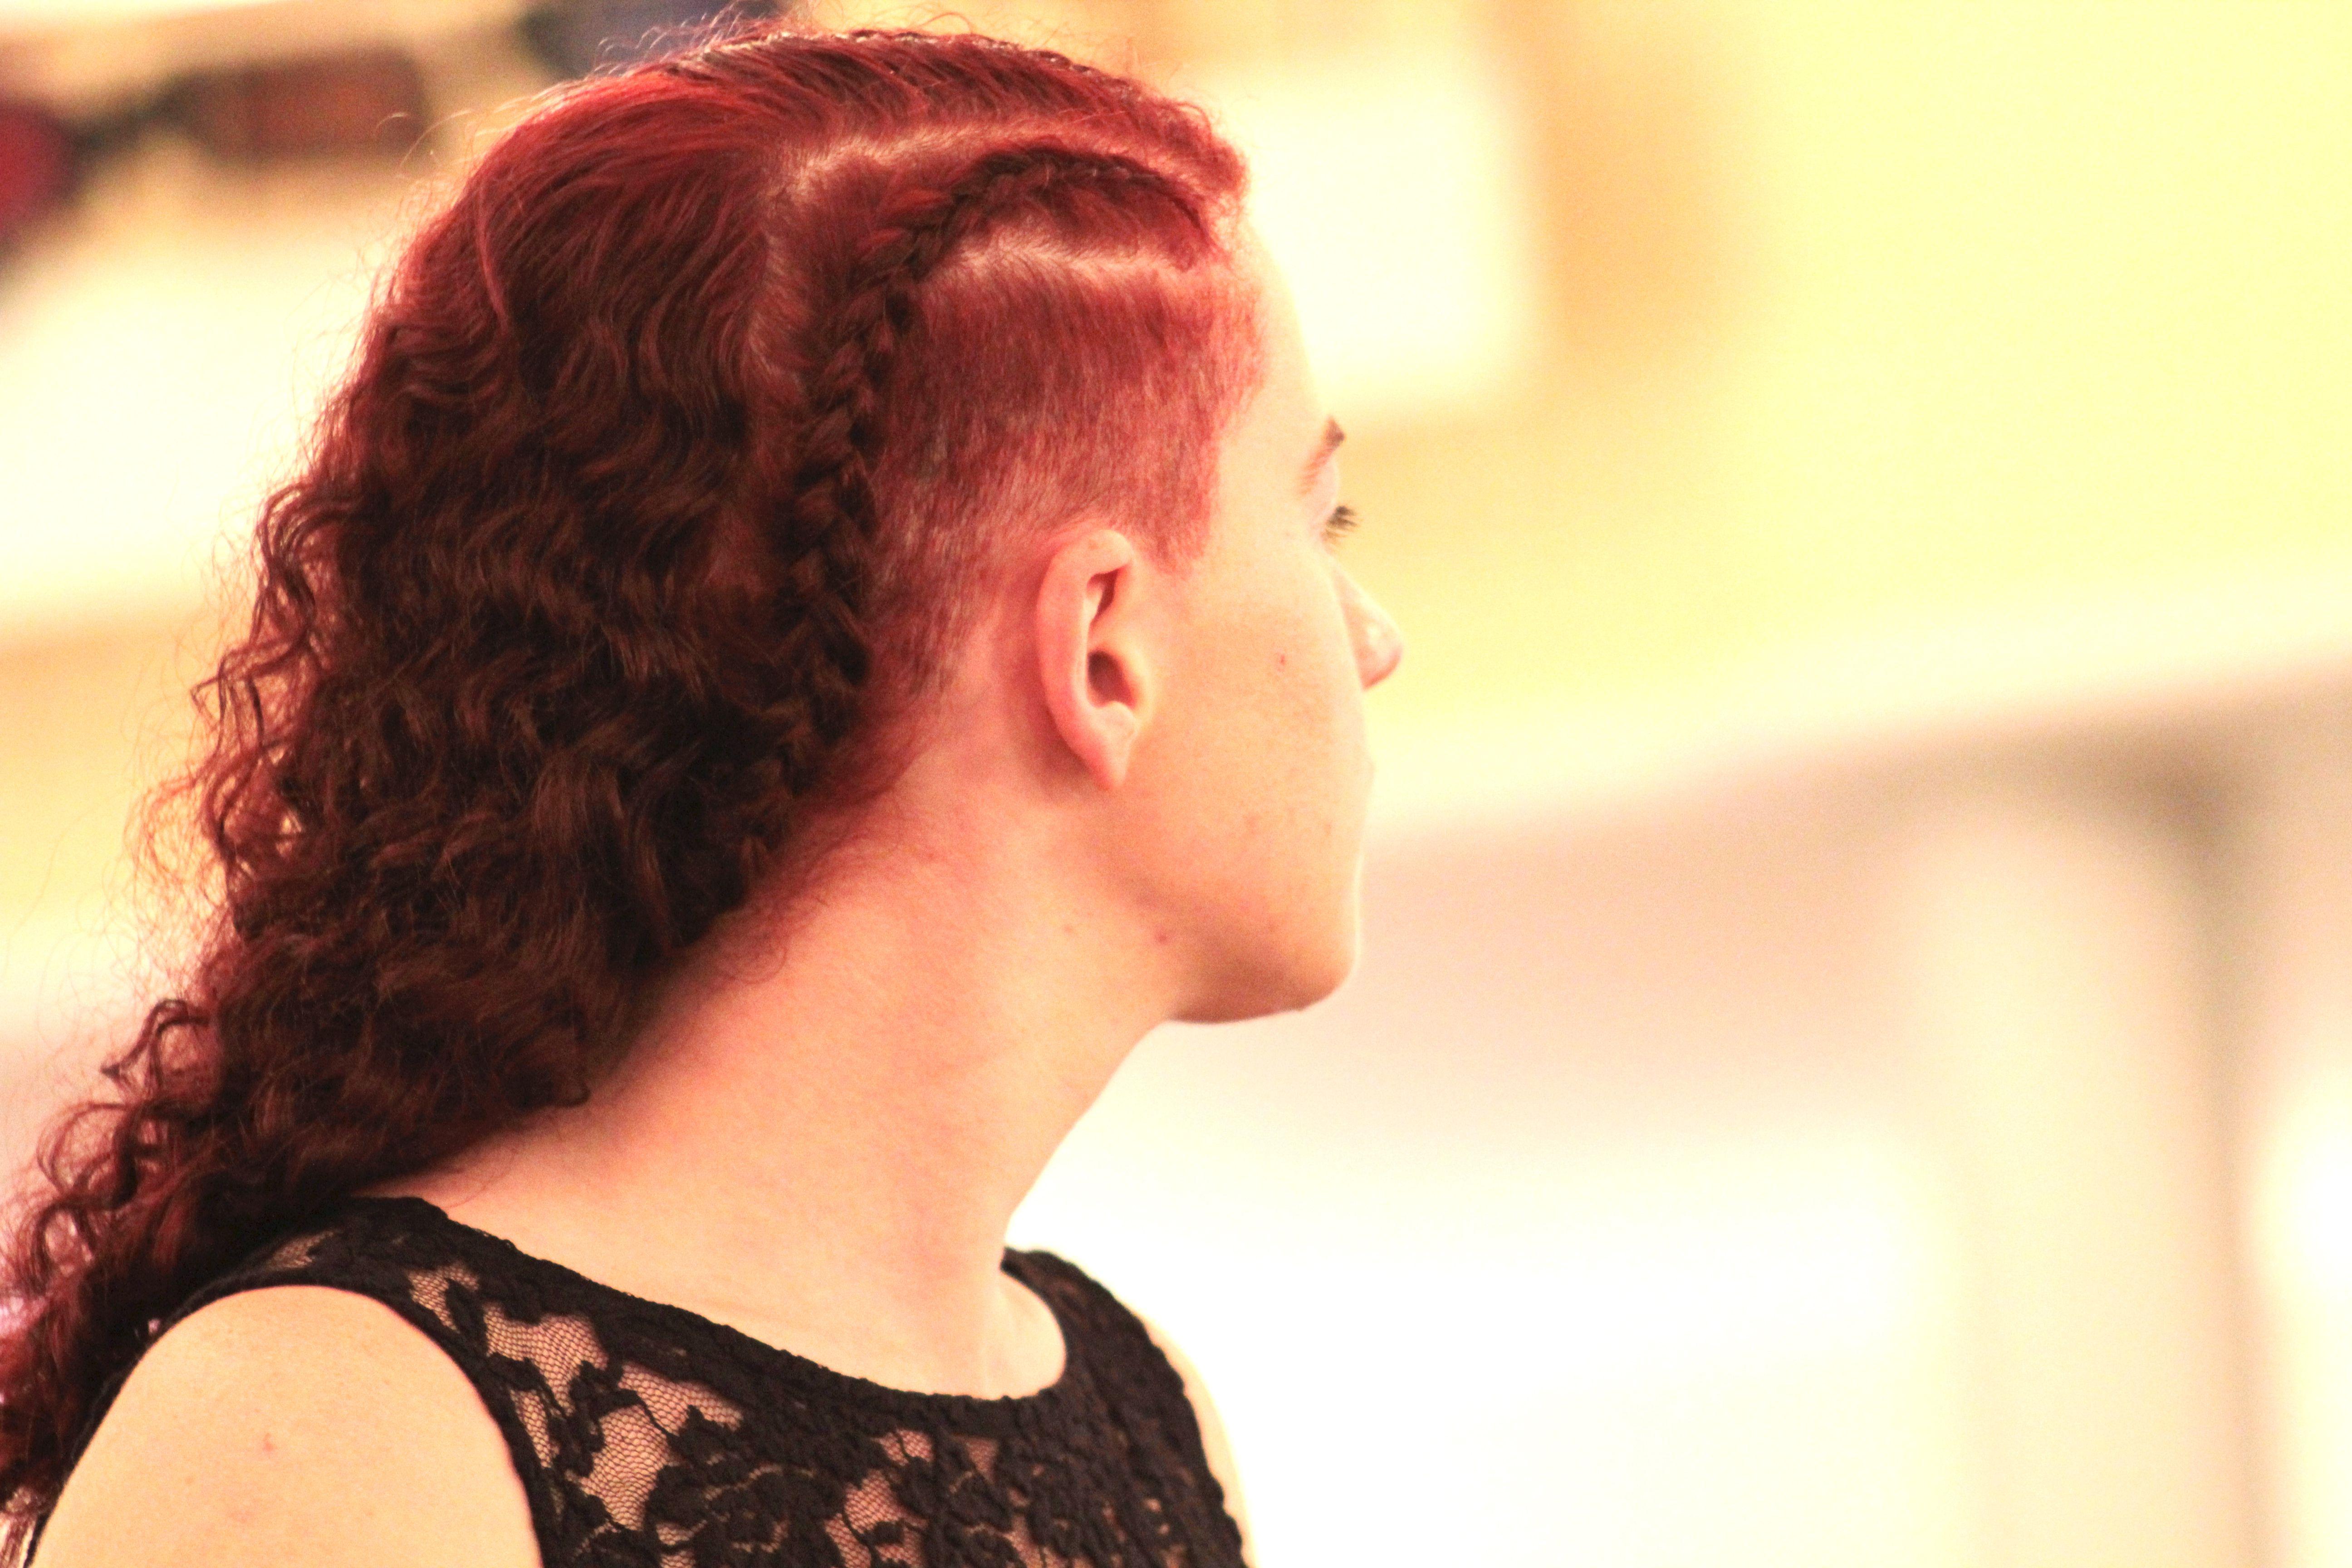 sidecut geflochten Haare schneiden haircut frisuren style